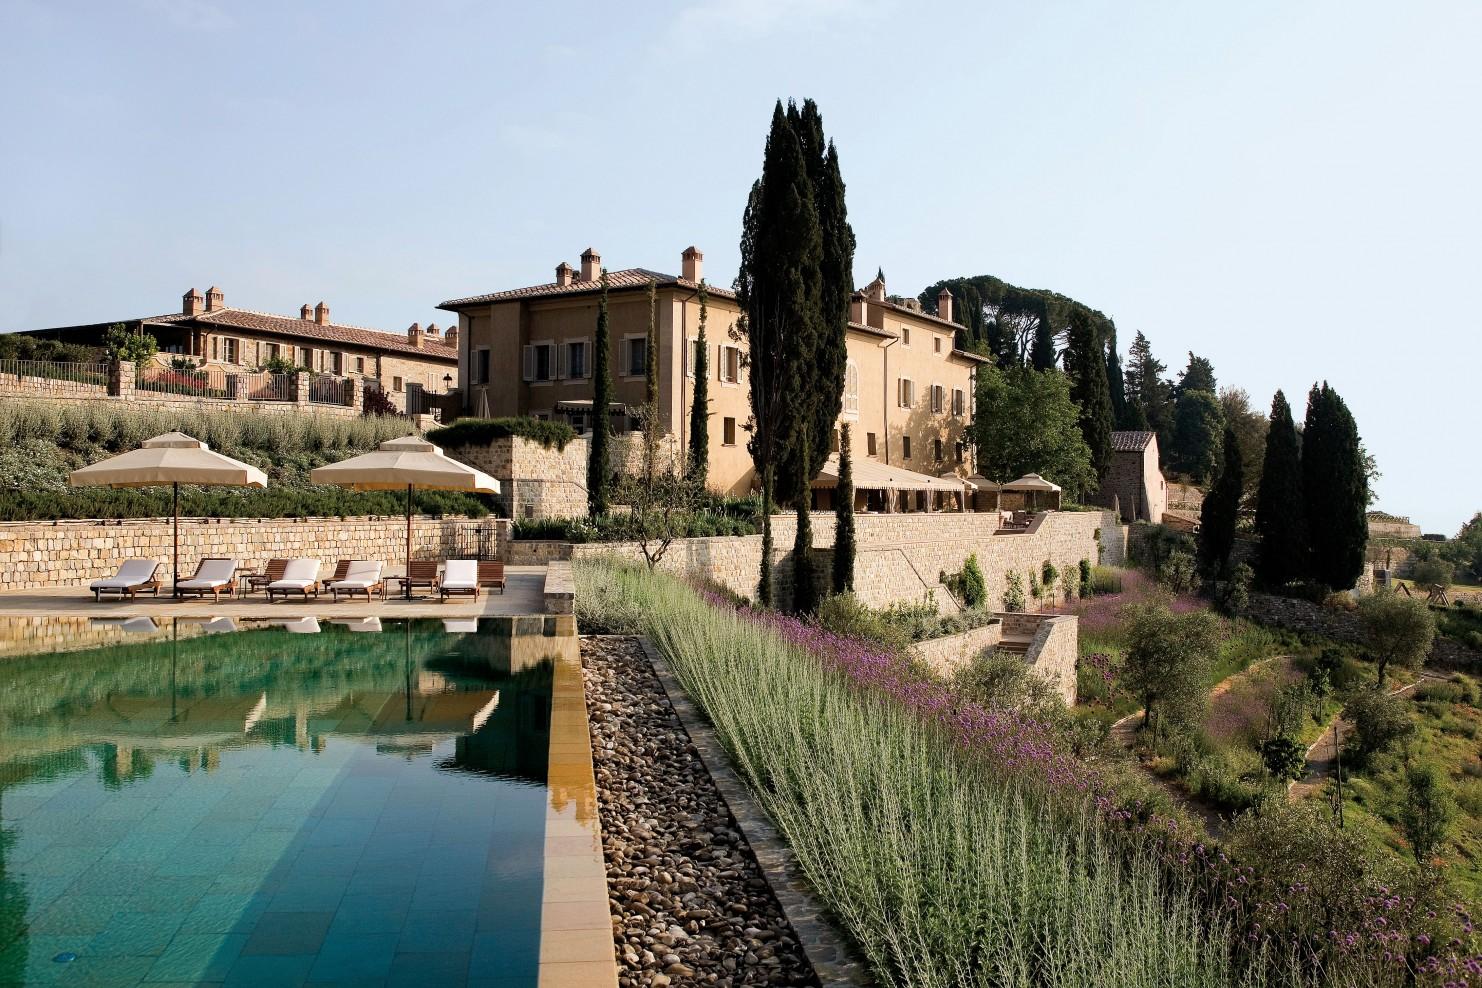 3619428-castiglion-del-bosco-hotel-tuscany-italy